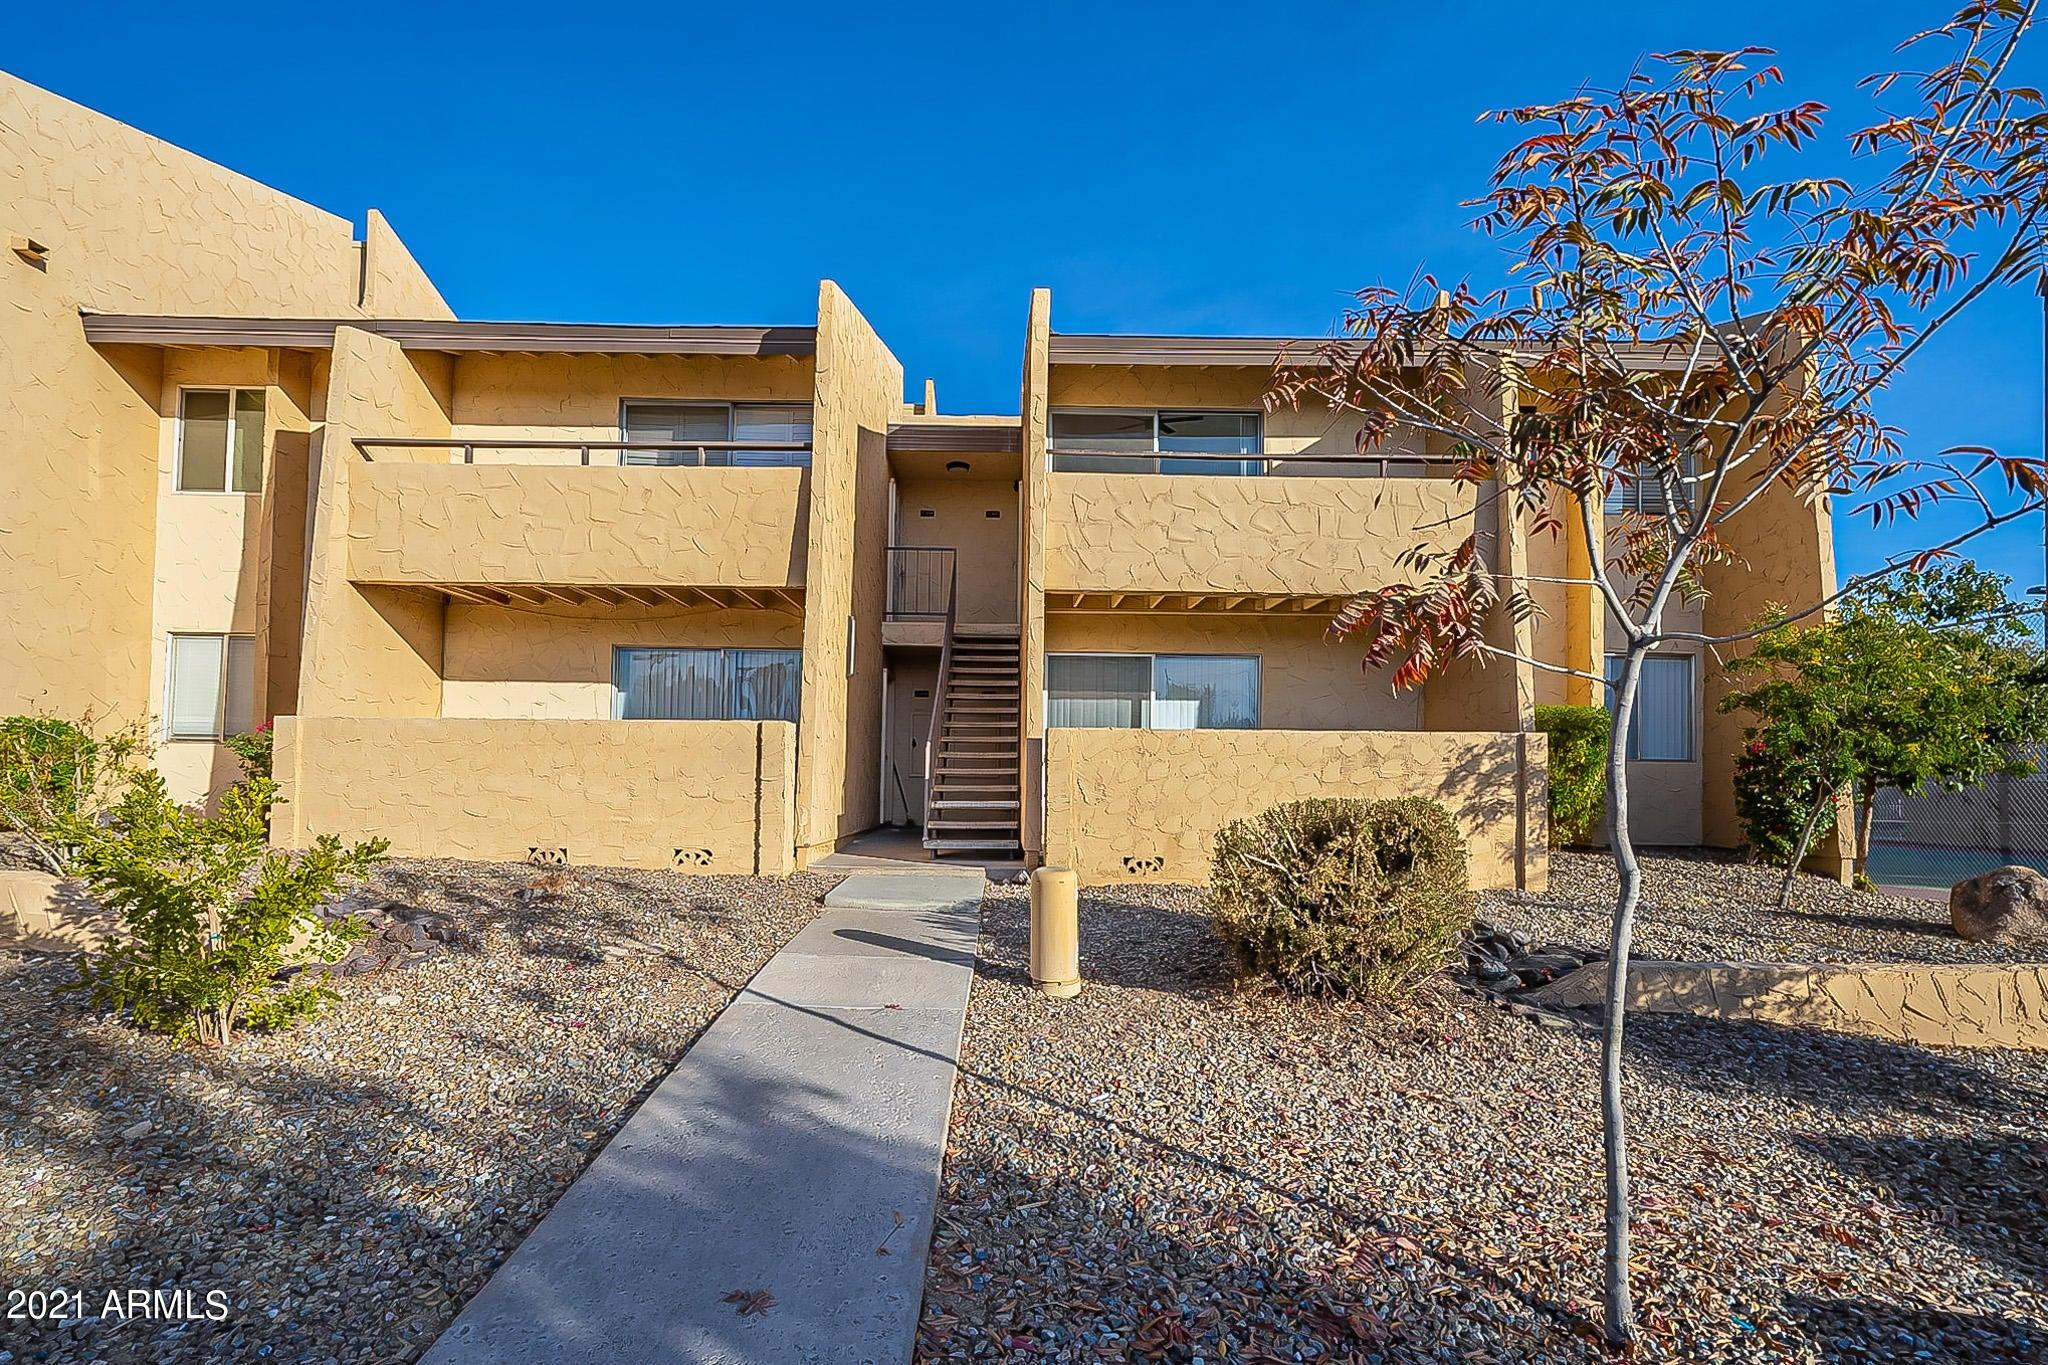 8055 E THOMAS Road, C207, Scottsdale, AZ 85251